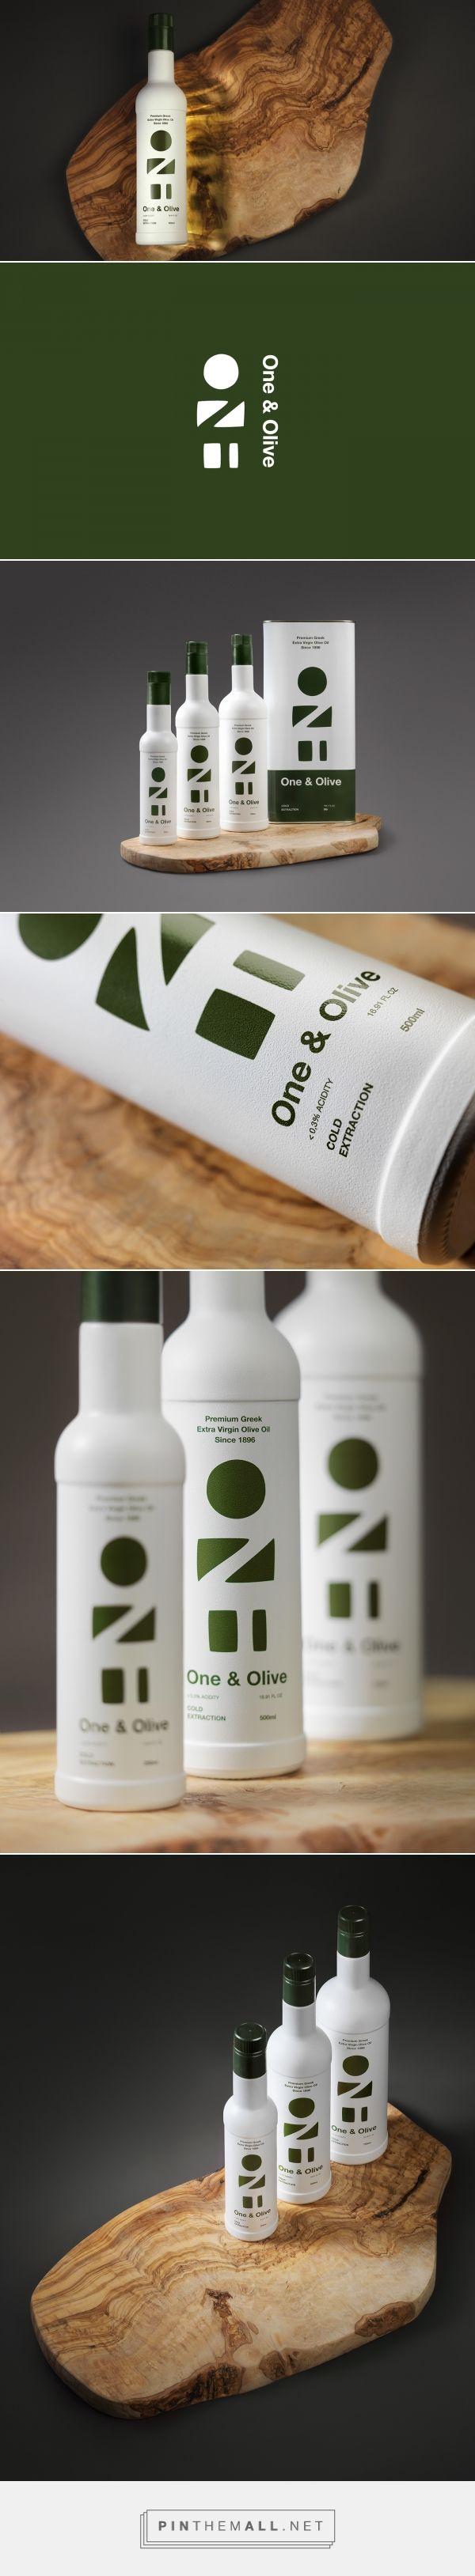 e & Olive Premium Greek Extra Virgin Olive Oil on Behance